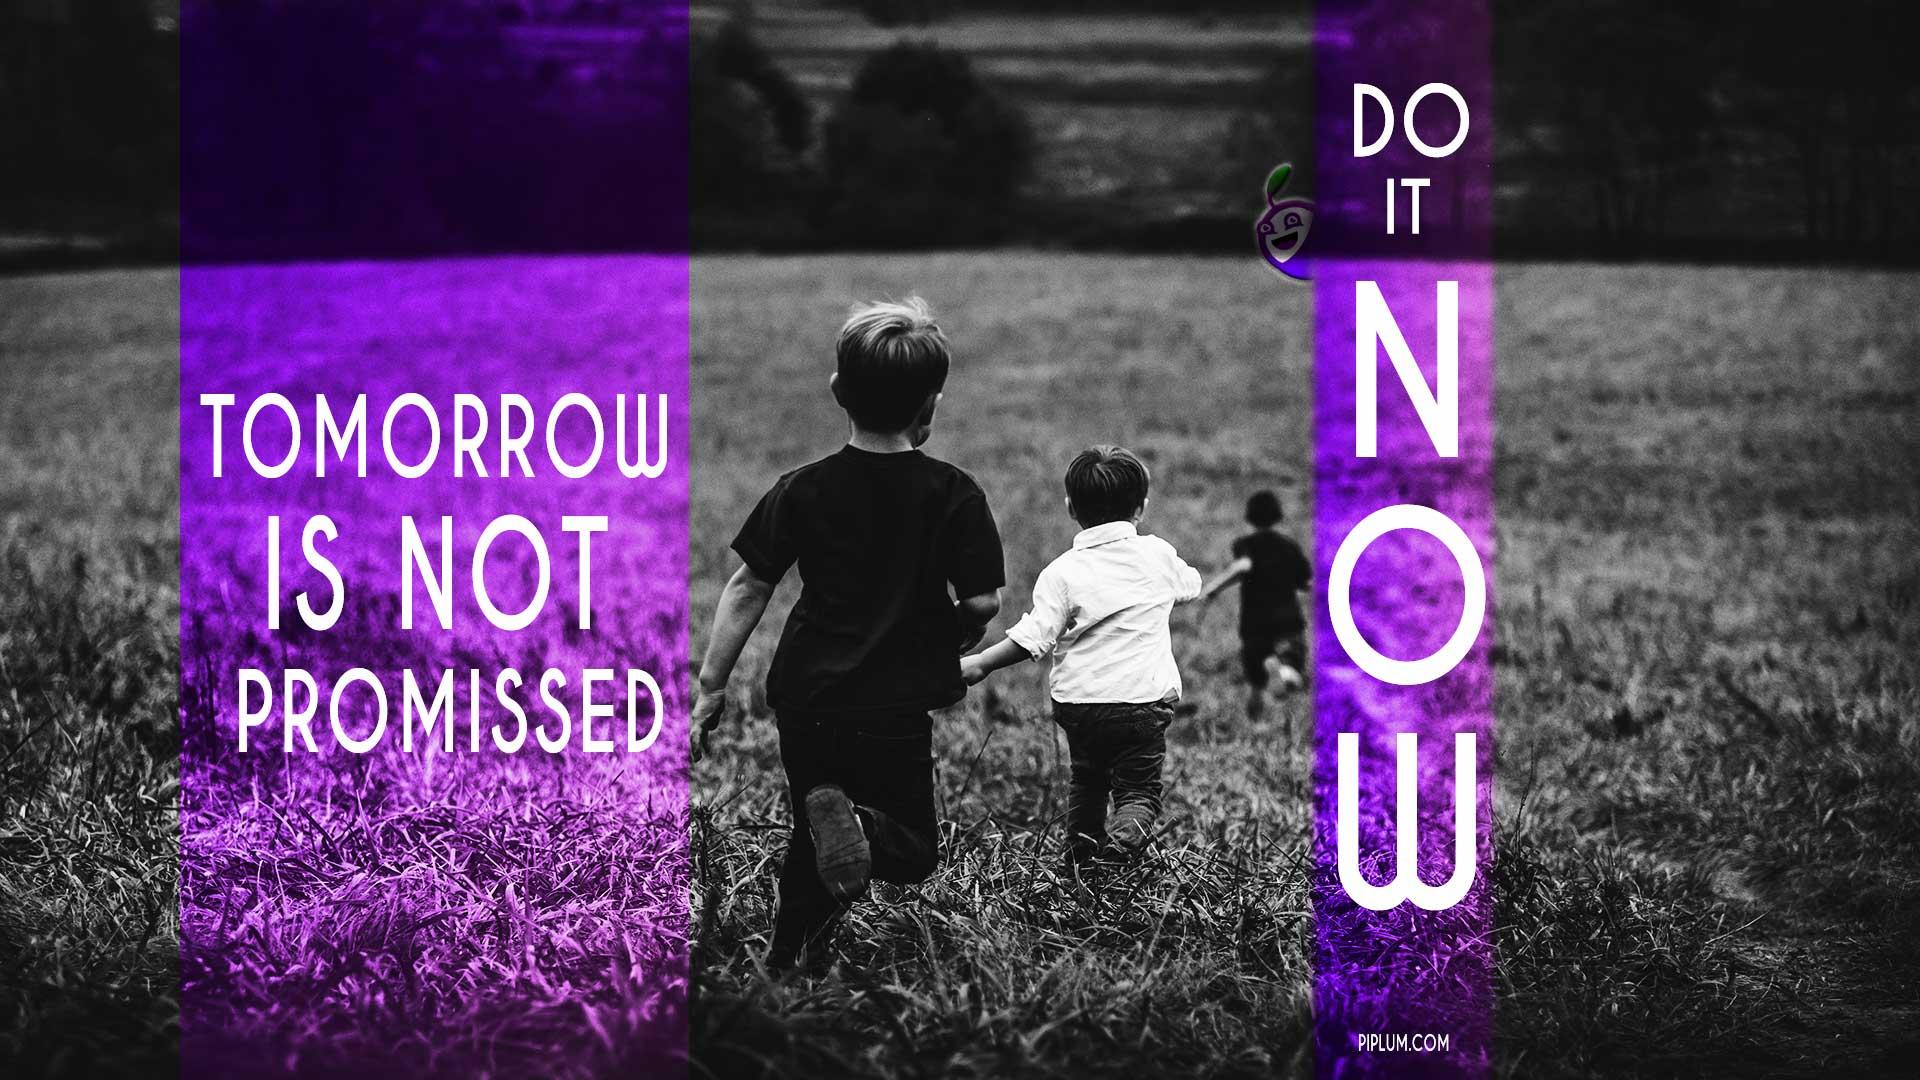 Tomorrow Never Promised Piplum Motivation